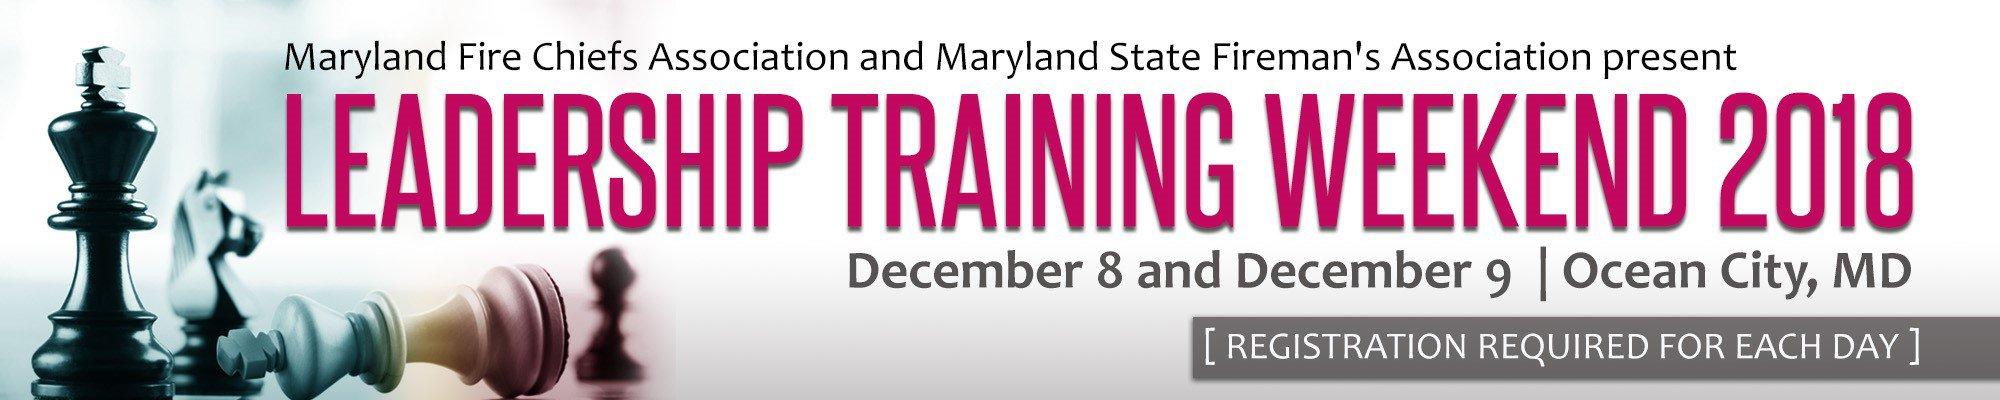 MSFA's Leadership Training Weekend